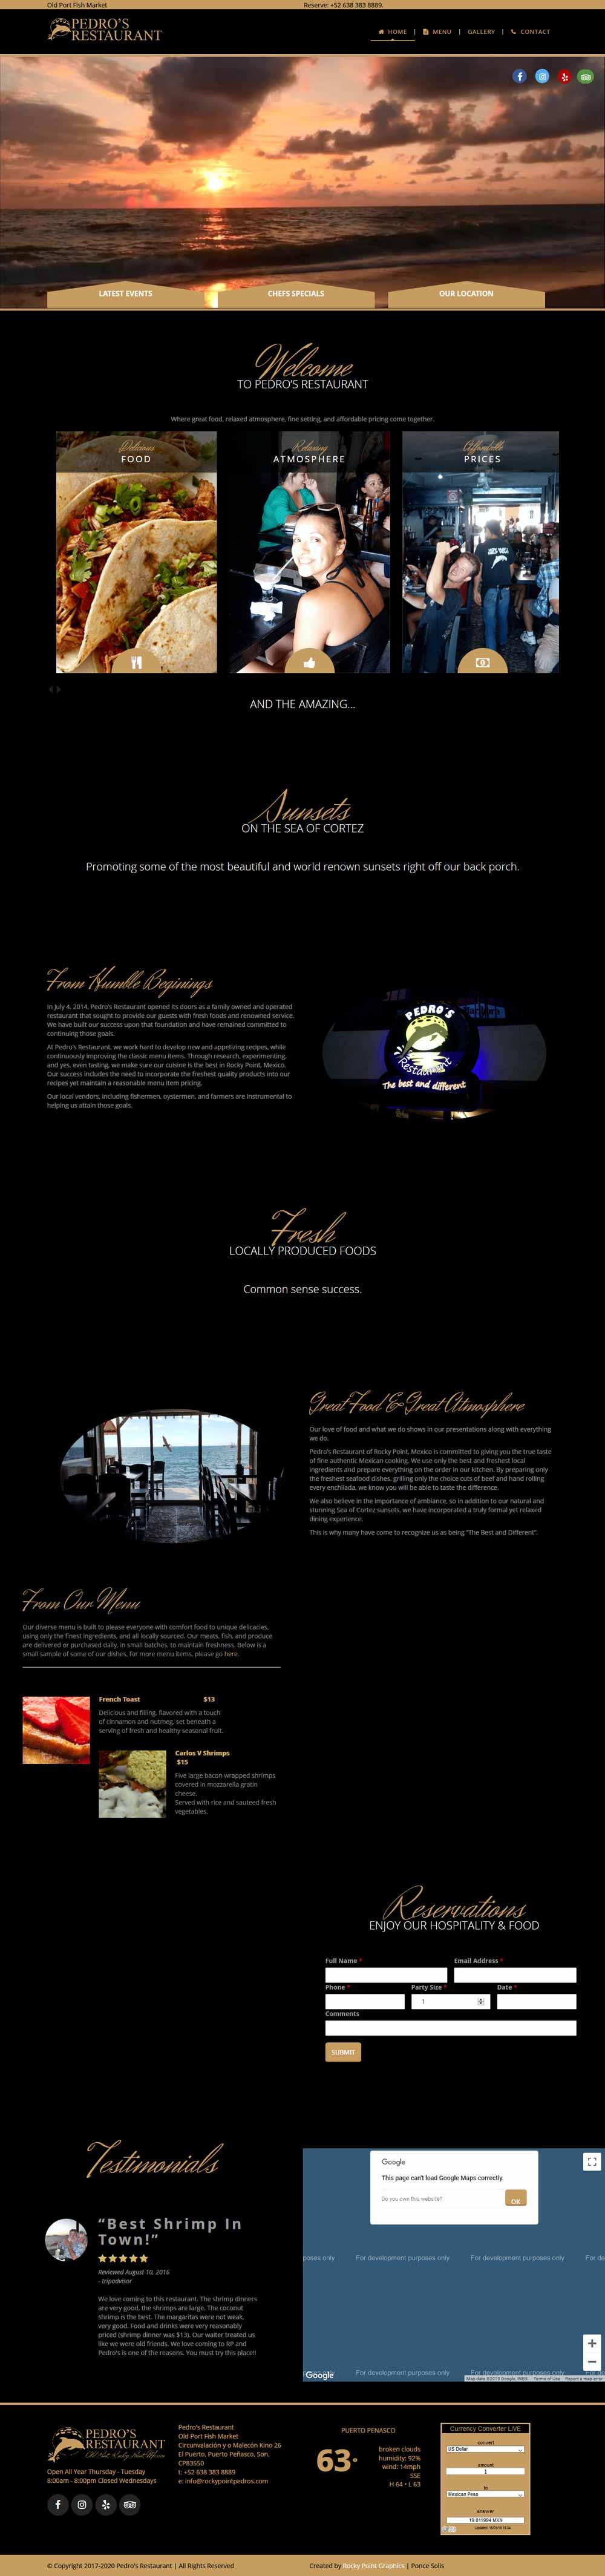 Pedro's Restaurant in Puerto Penasco (Rocky Point Mexico). Click here to visit Pedro's website.